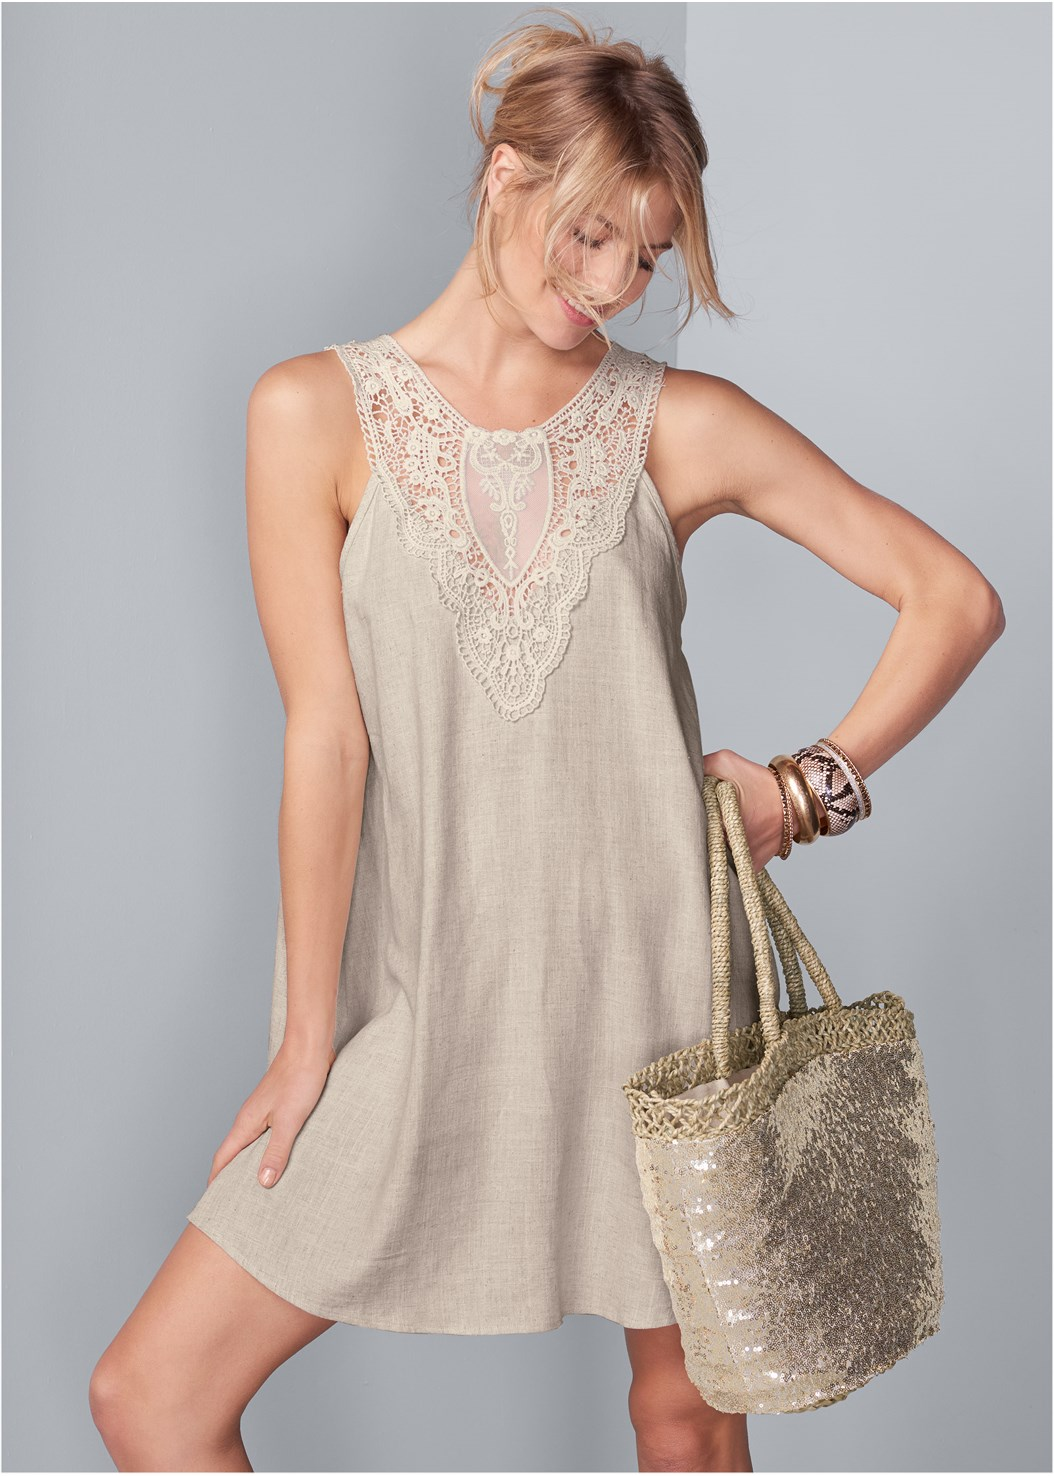 Lace Detail Linen Dress,Venus Cupid Bra,Embellished Wedge